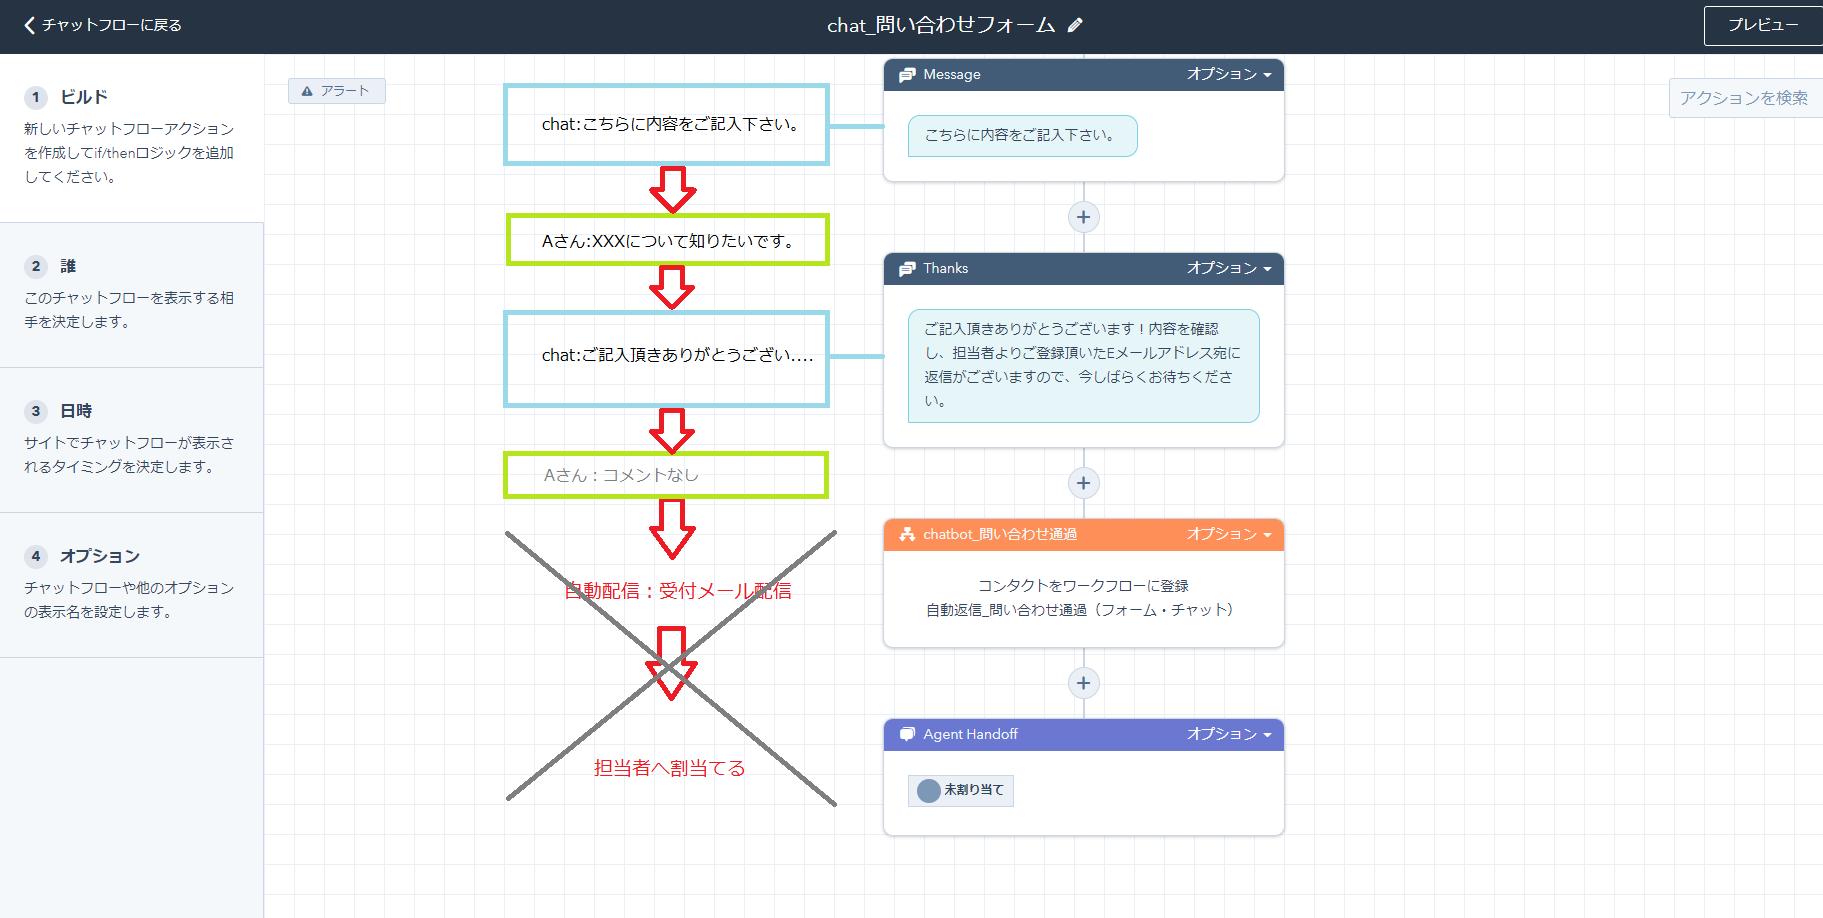 marketing-chat-bot-hubspot-customer-support_setting_03